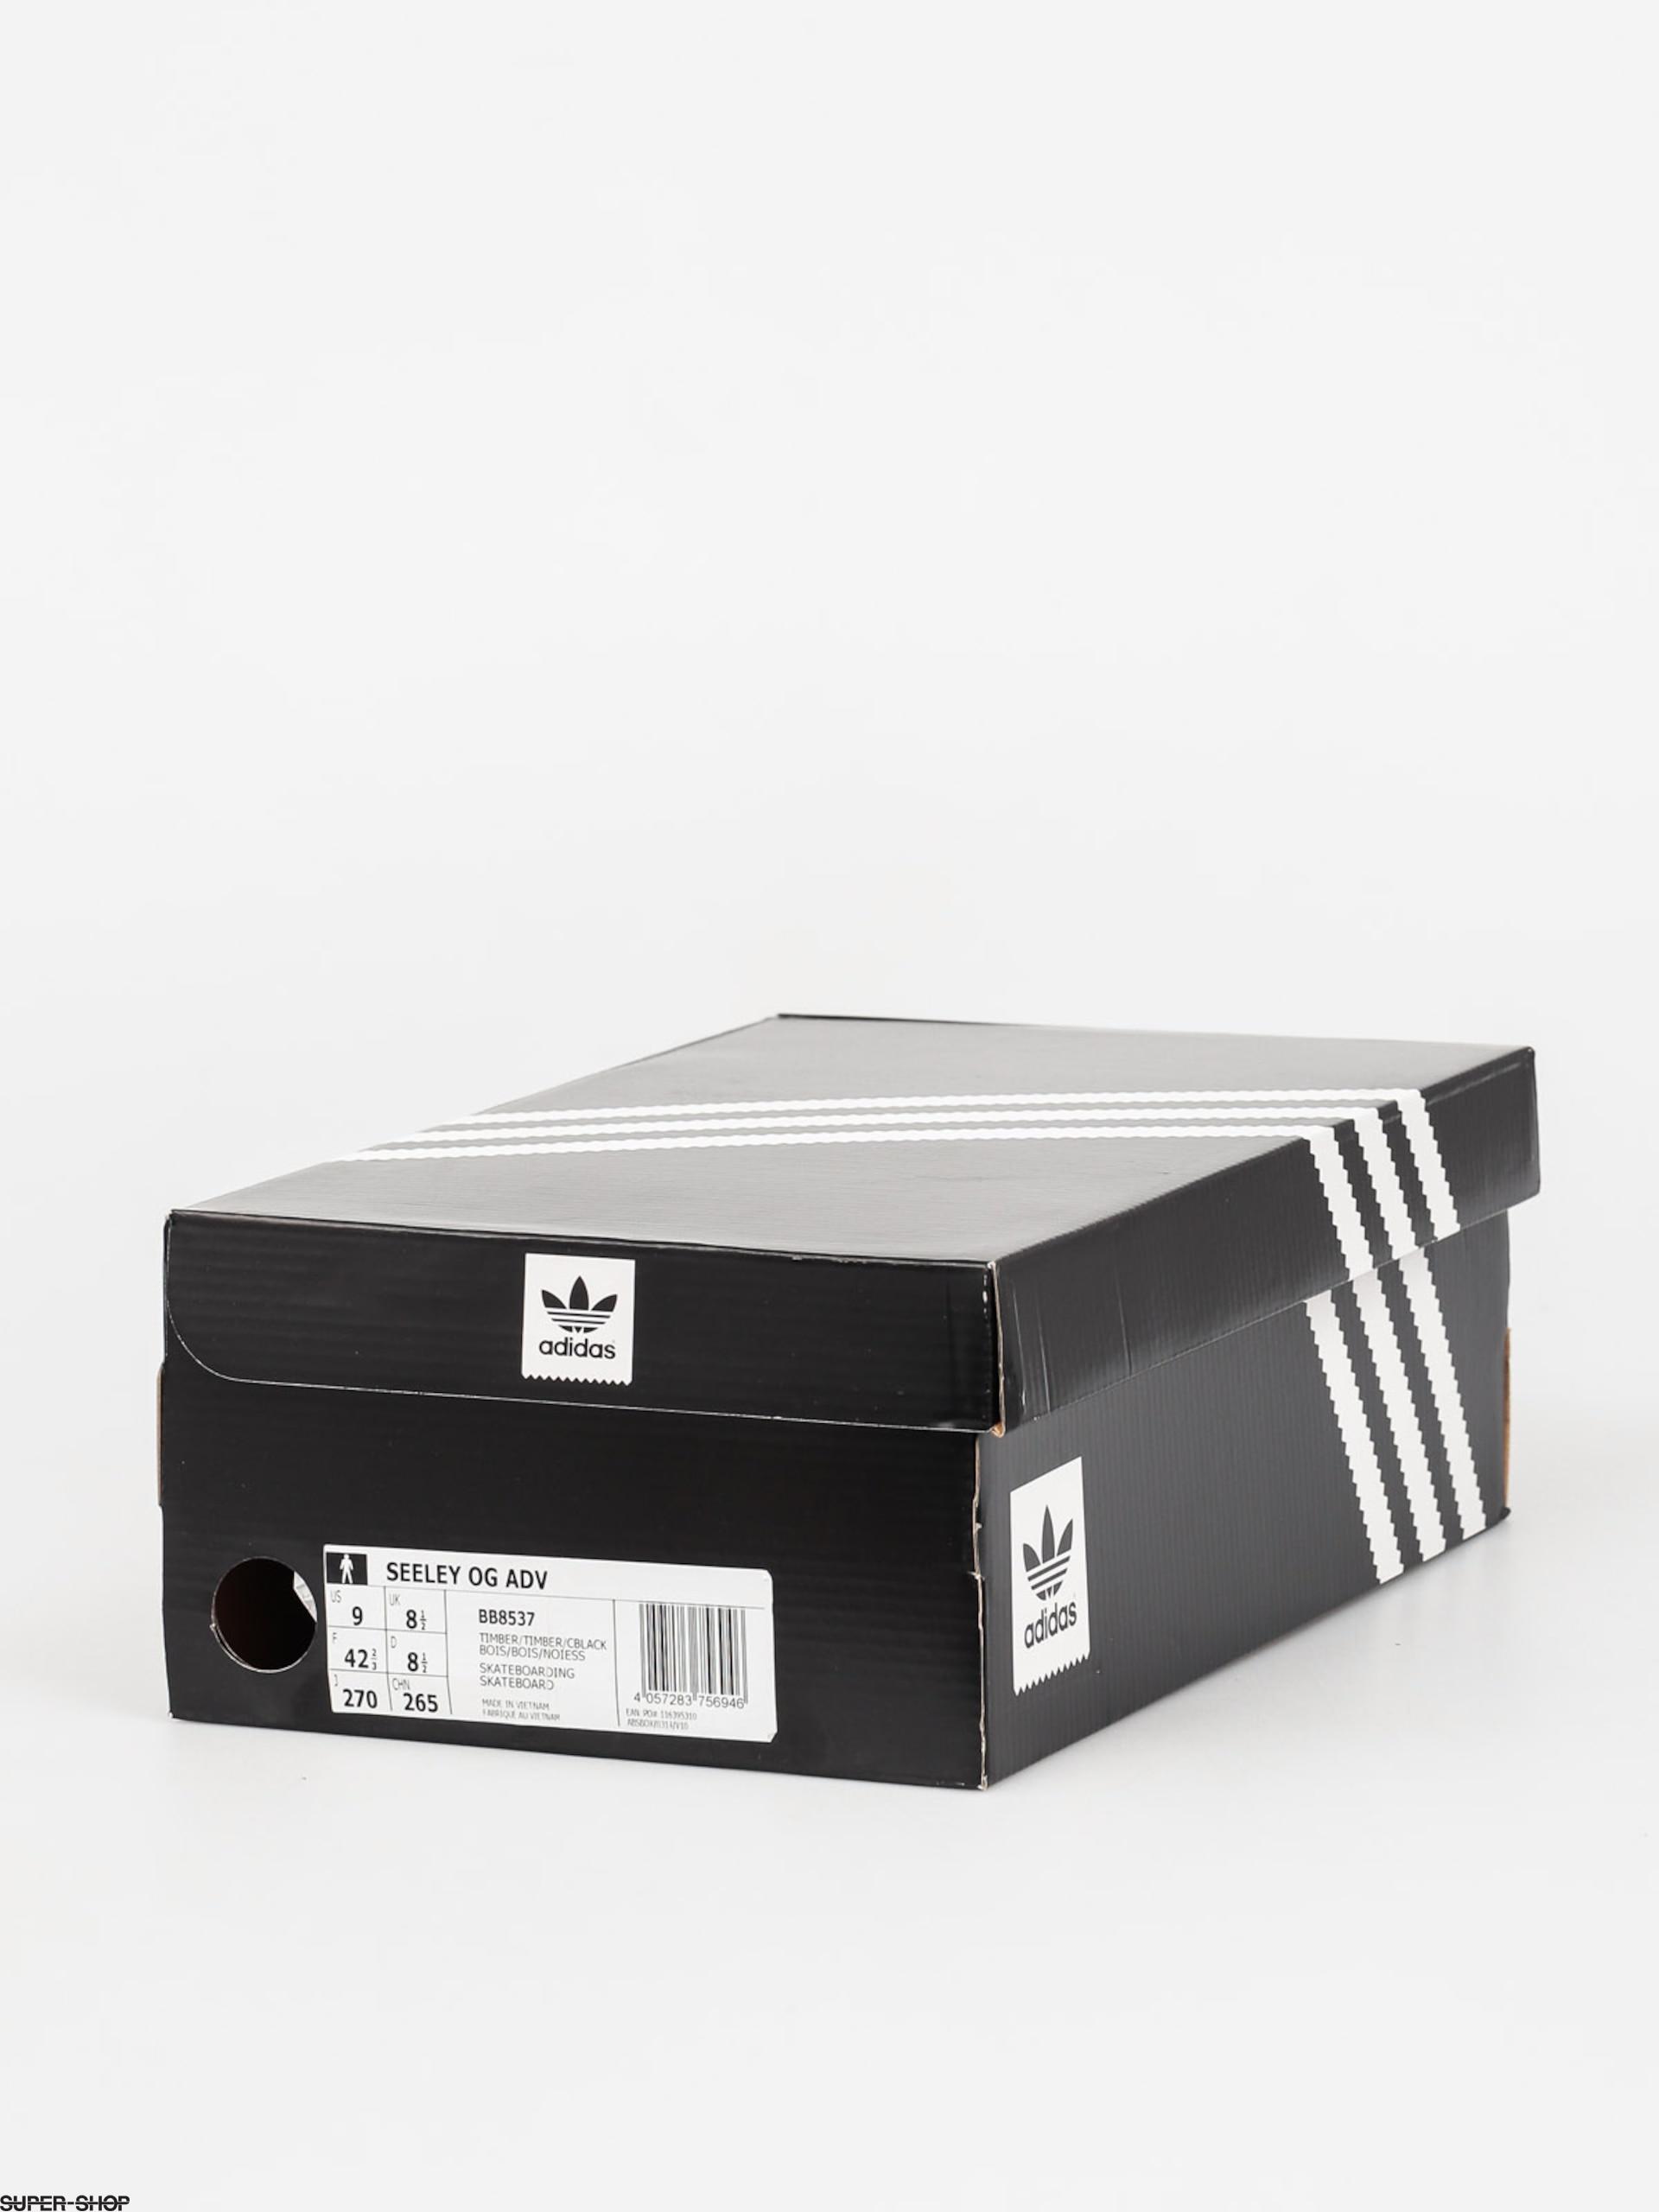 le adidas seeley og avanzata (legno - legno / cblack)